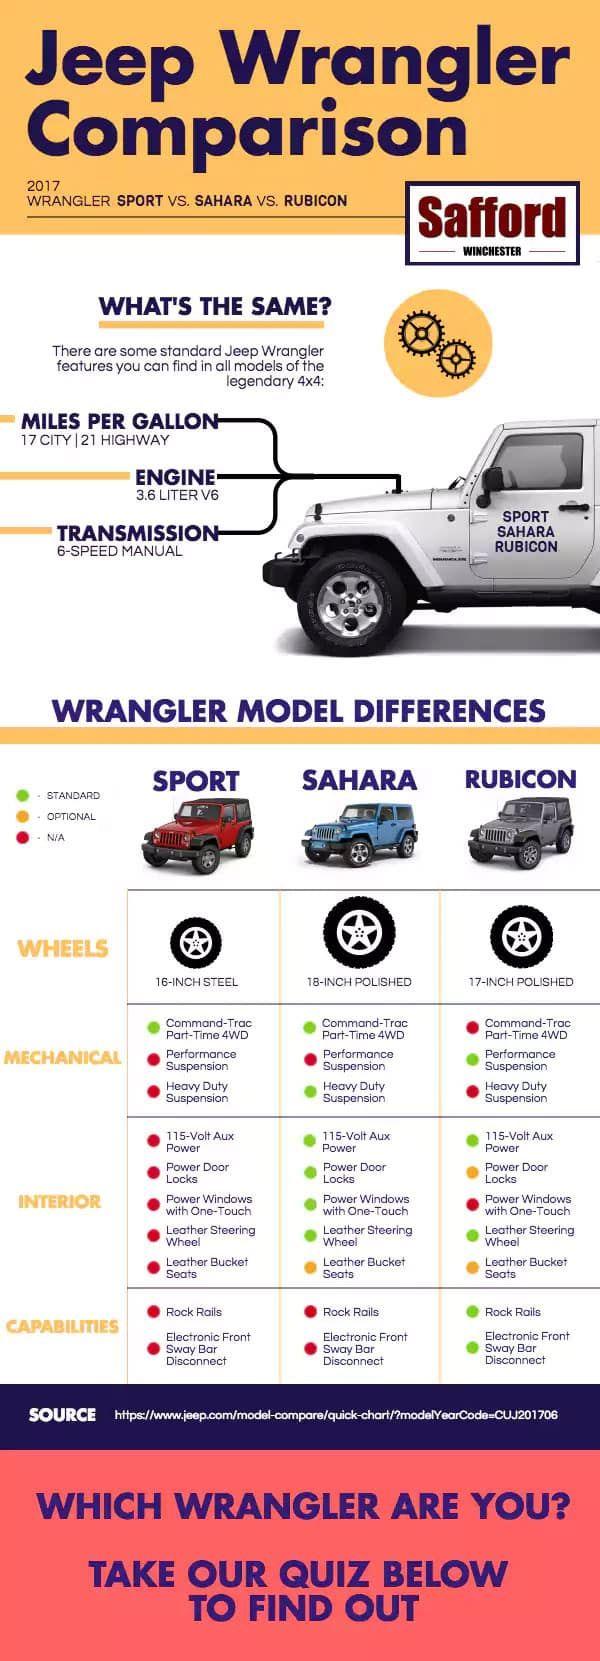 Best Jeep Wrangler For You Sport Vs Sahara Vs Rubicon Comparison Best Jeep Wrangler Jeep Wrangler Unlimited Sahara Jeep